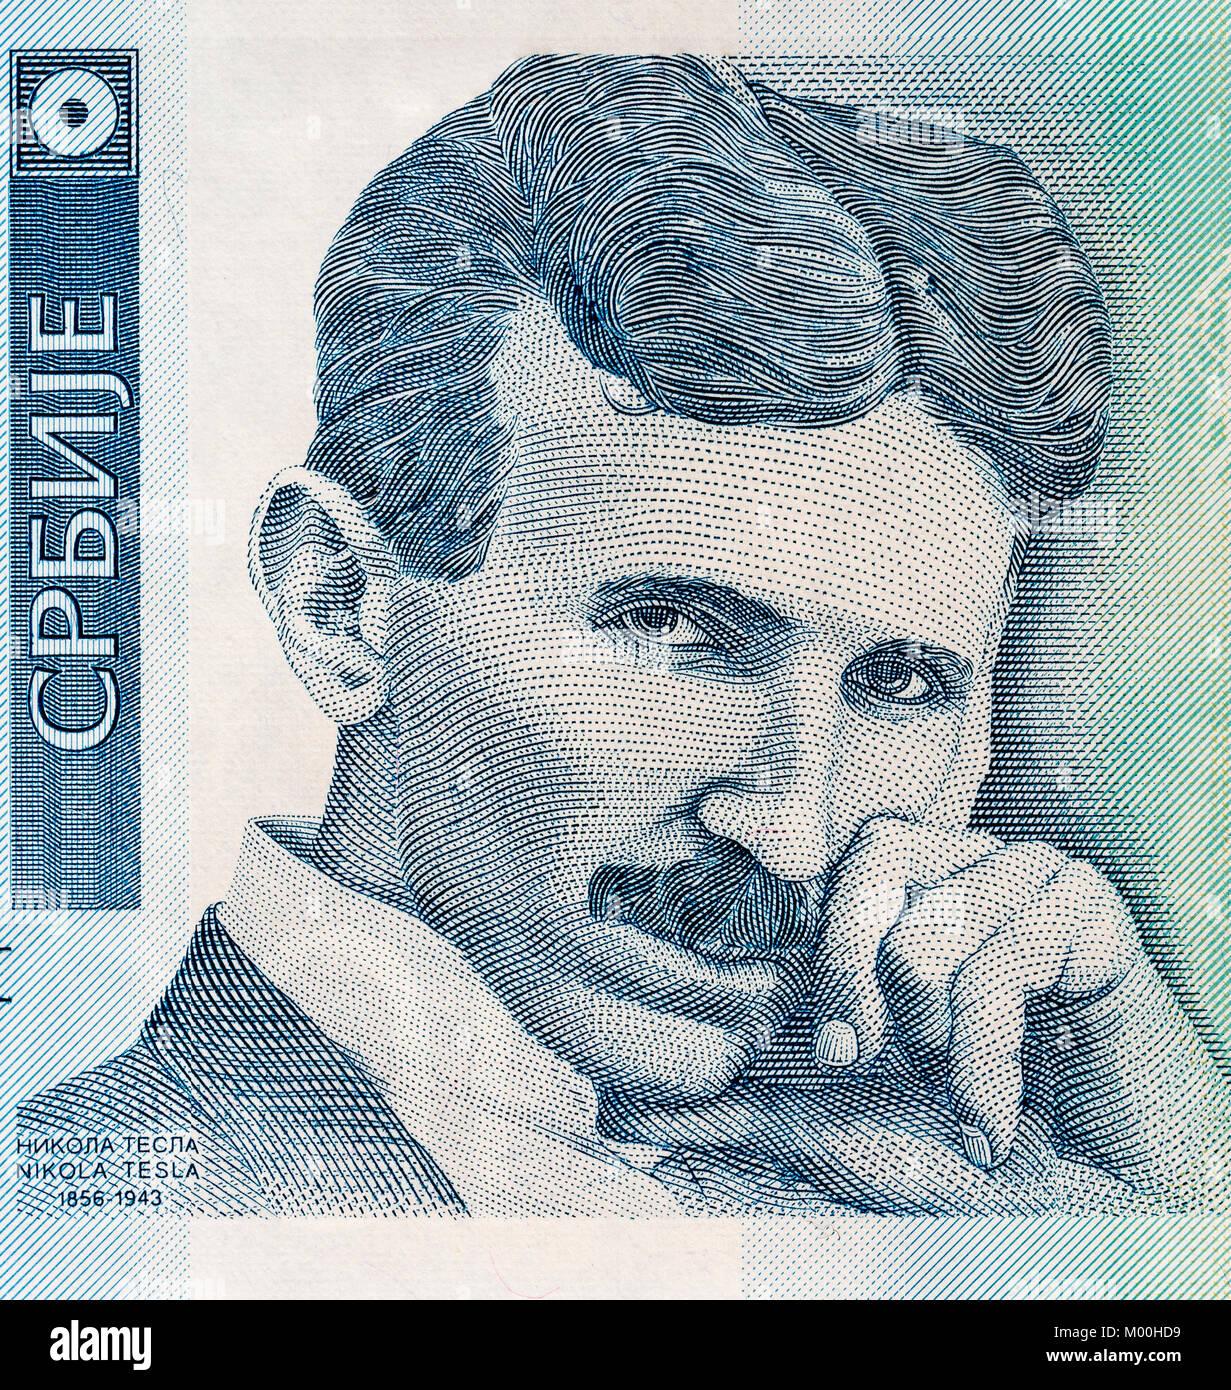 Nikola Tesla Wallpaper Hd: Tesla Radio Stock Photos & Tesla Radio Stock Images